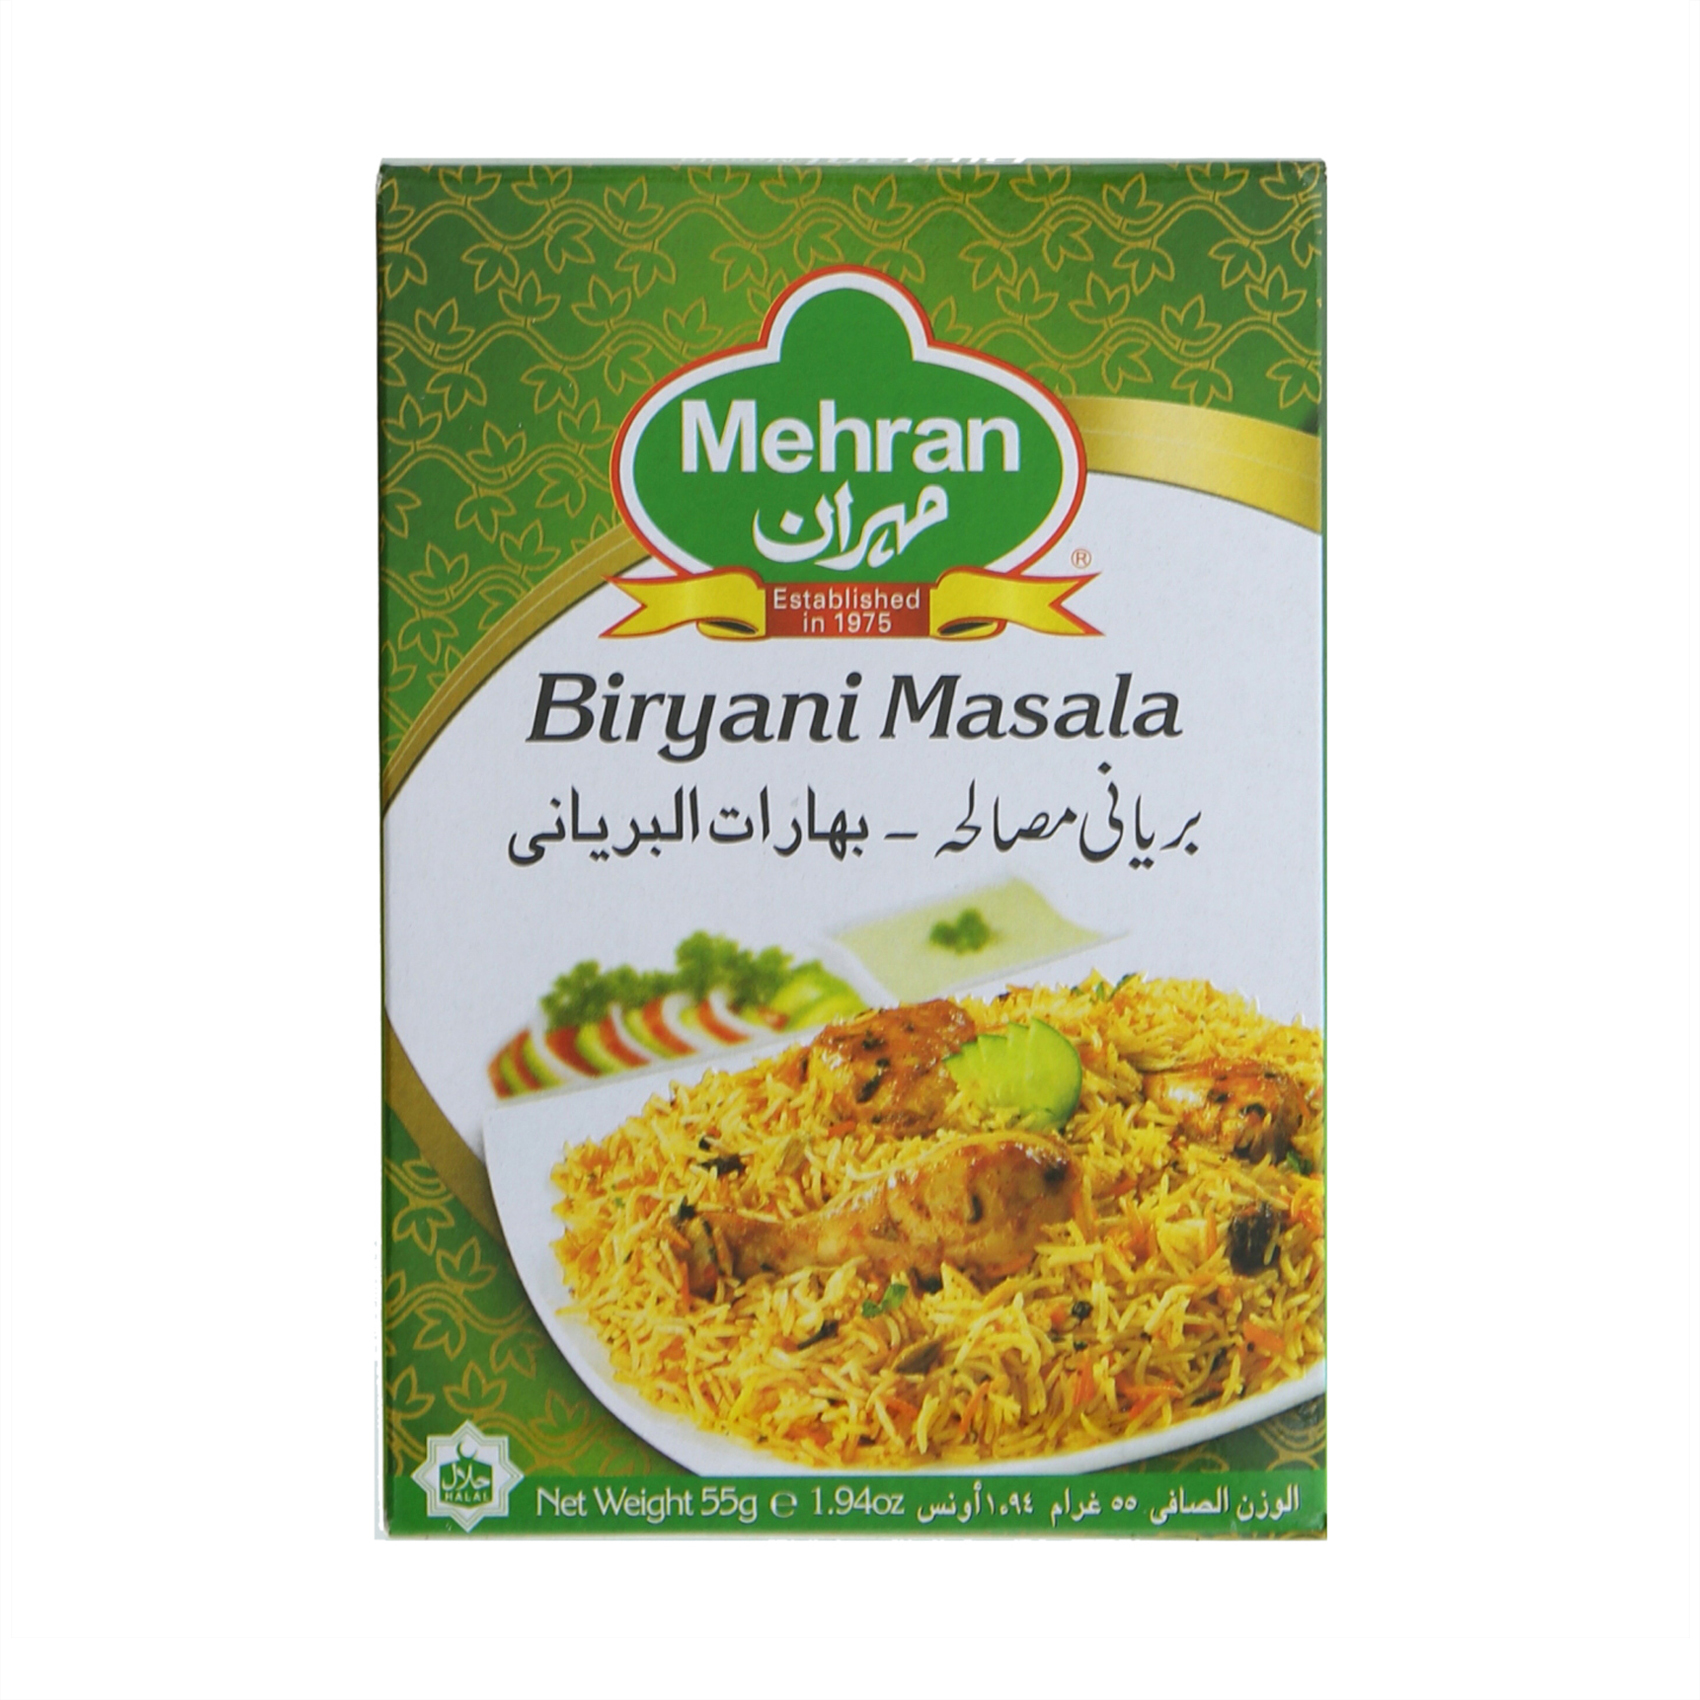 MEHRAN BIRIYANI MASALA POWDER 50G